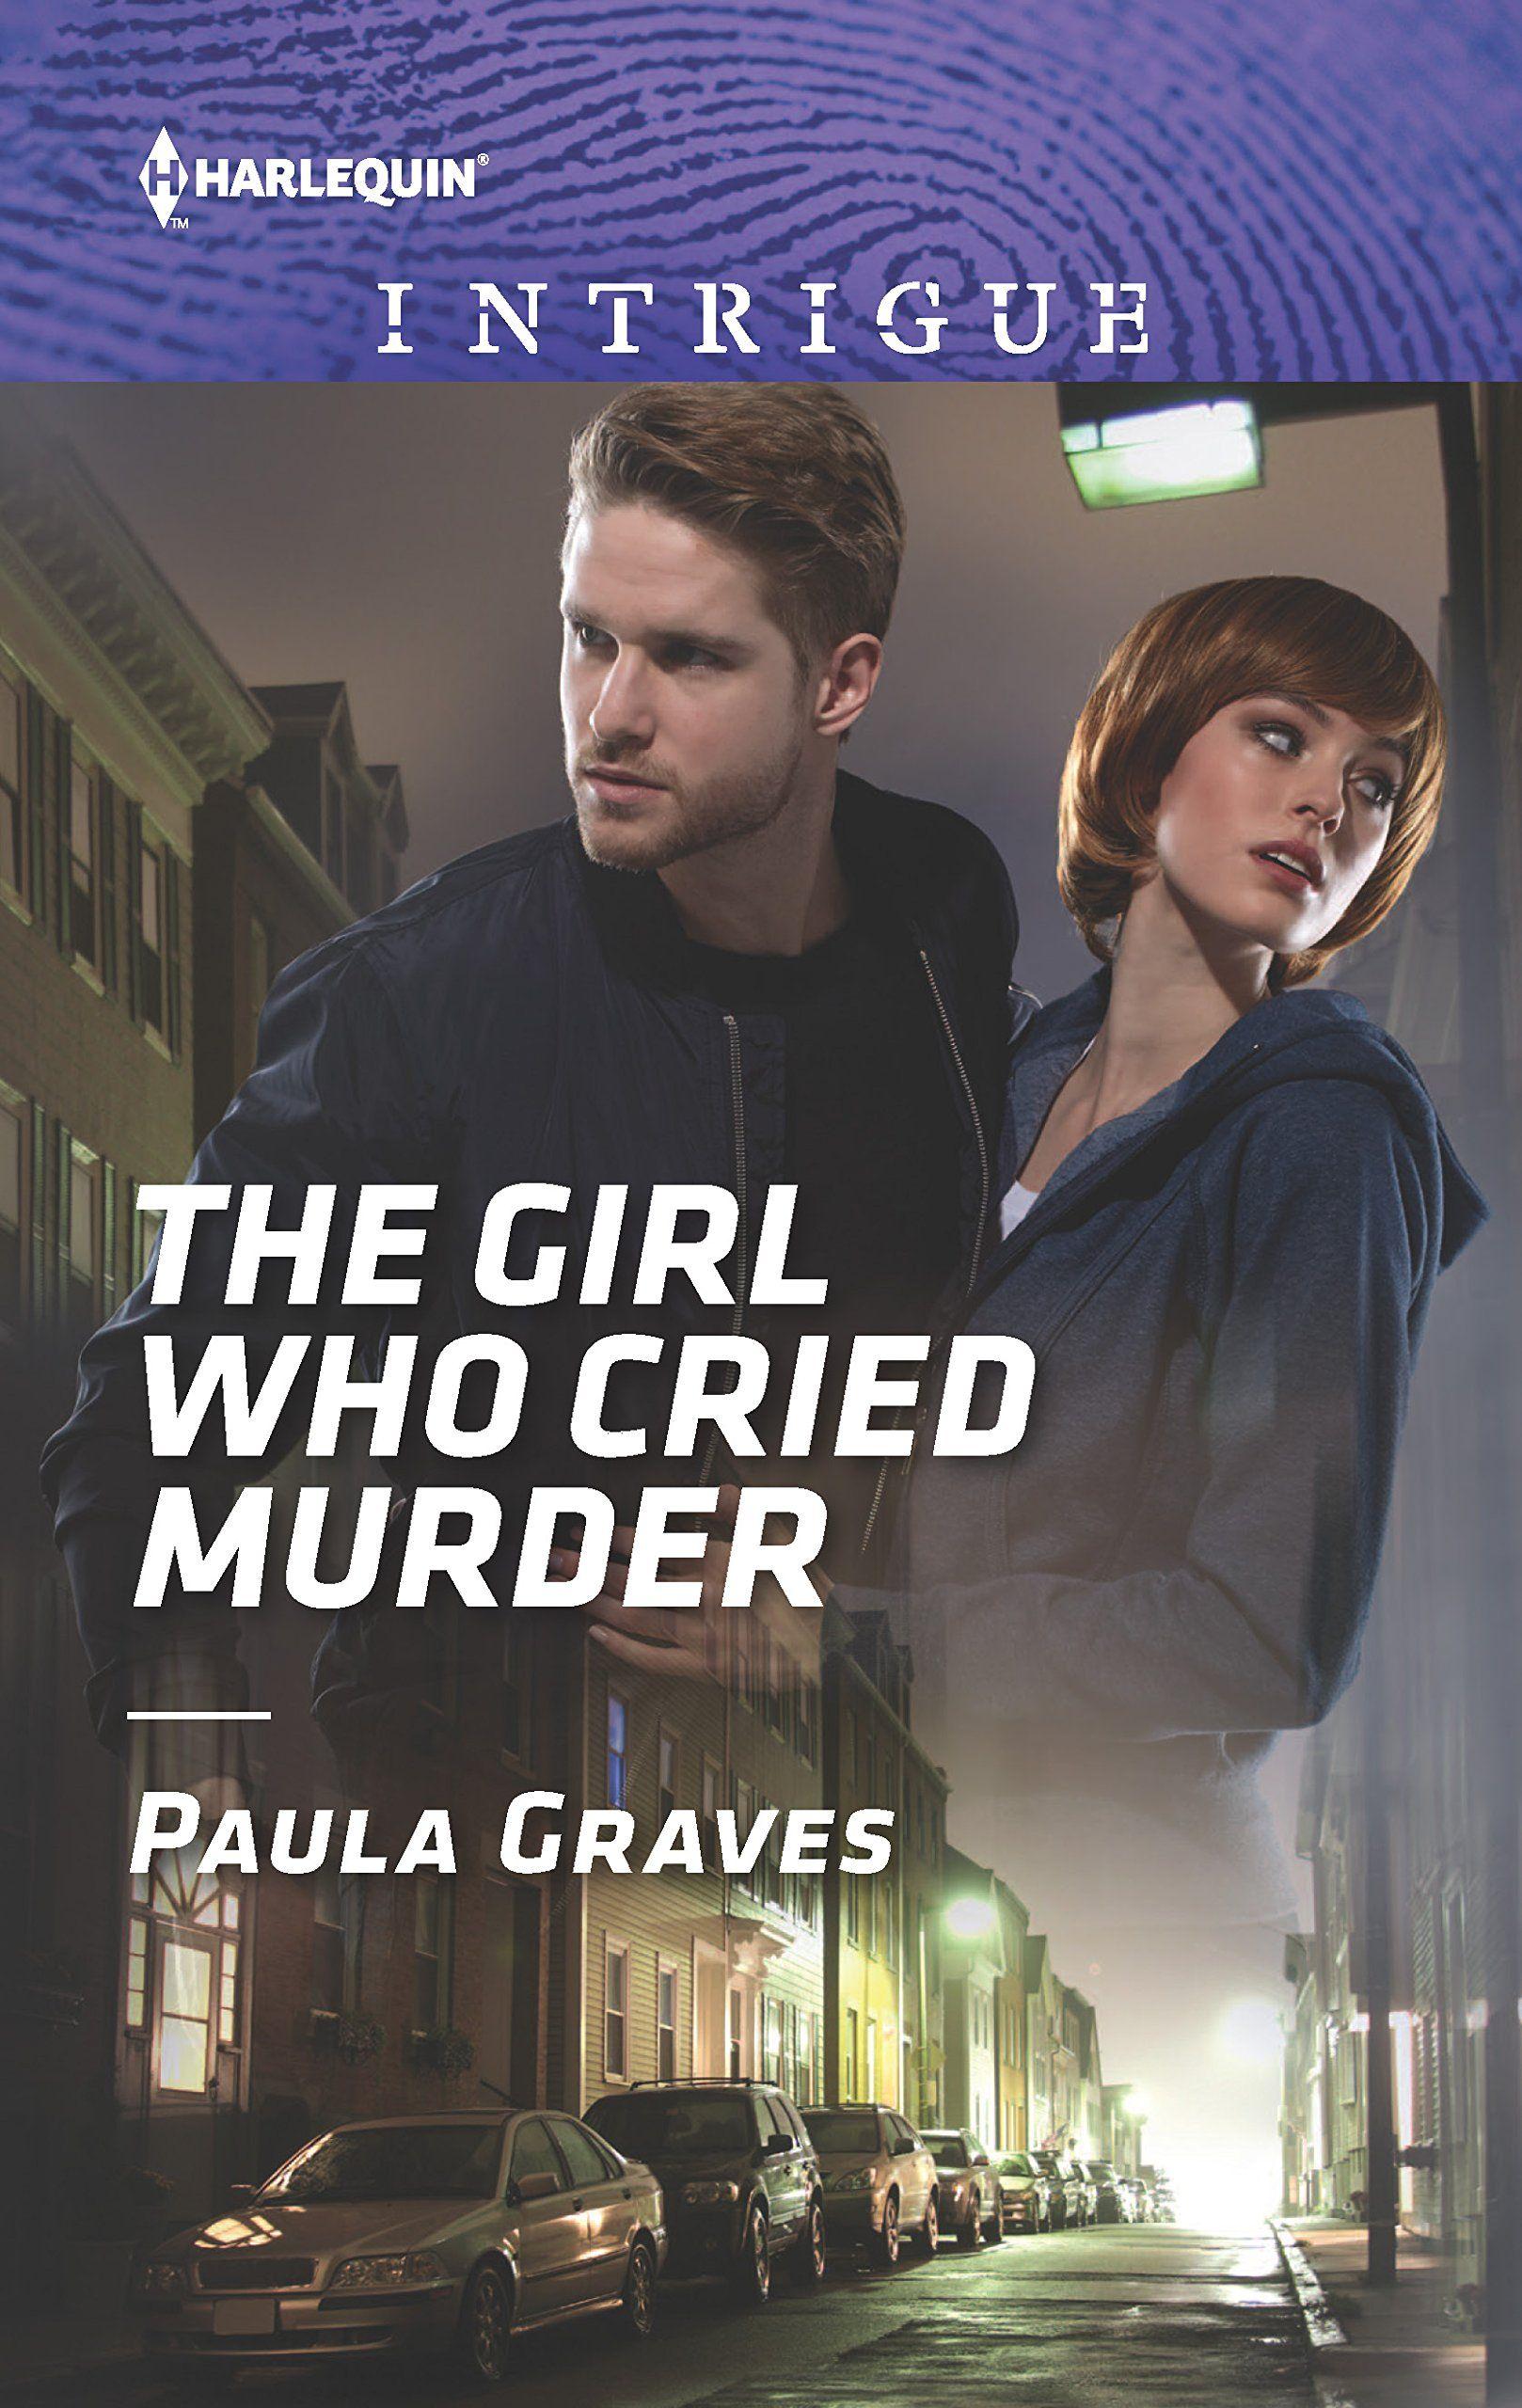 Paula Graves - The Girl Who Cried Murder / #awordfromJoJo #RomanticSuspense #PaulaGraves